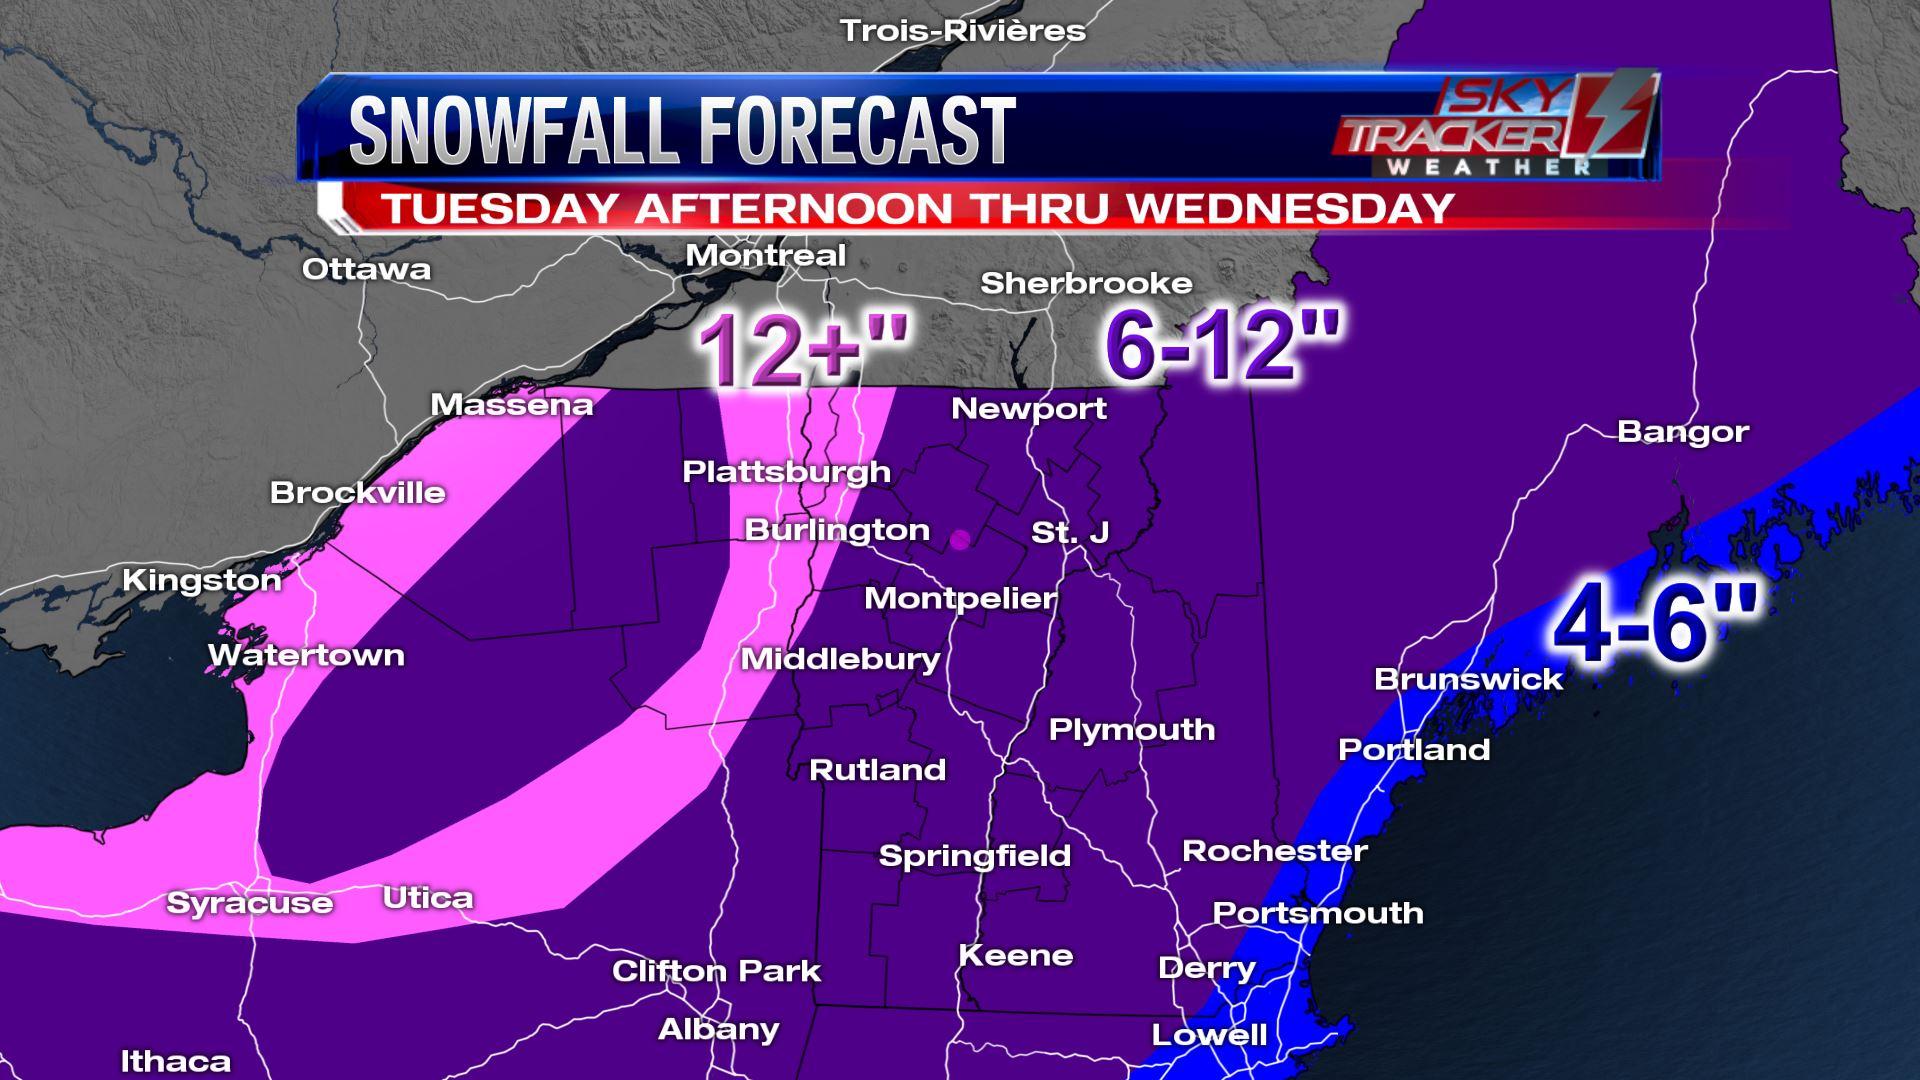 Forecast Snowfall through Wednesday